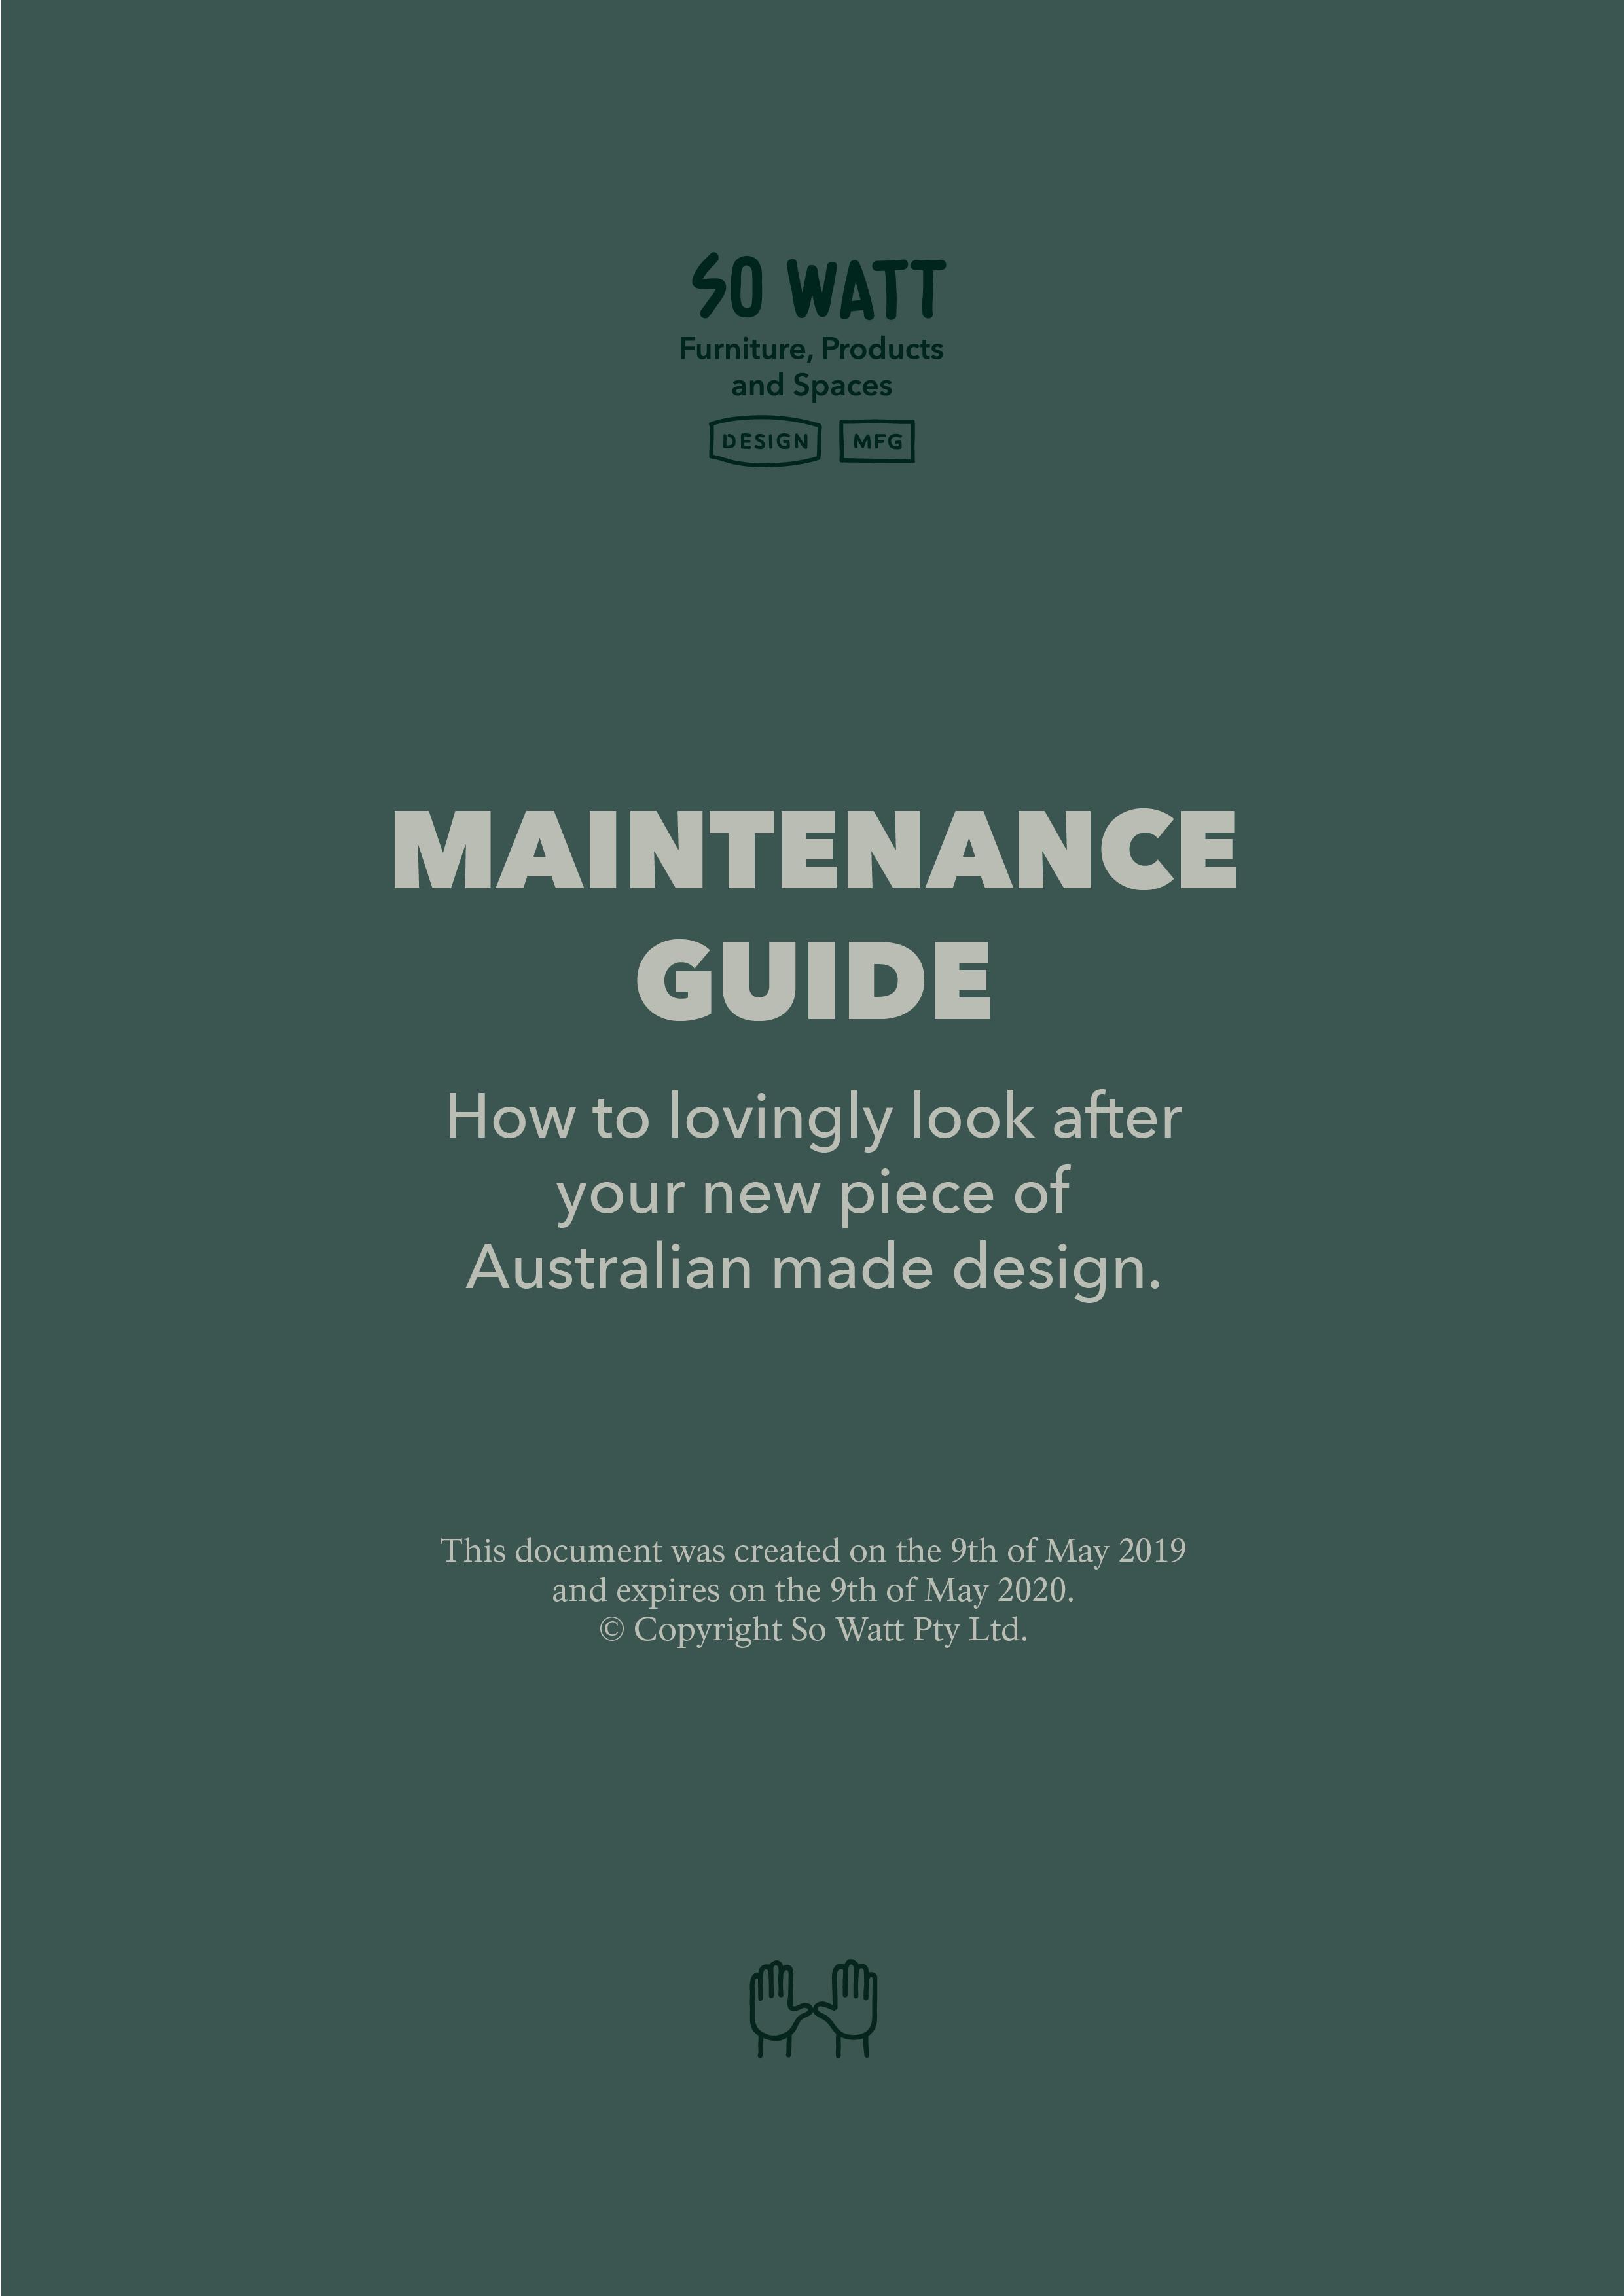 So Watt - Maintenance Guide-01.png